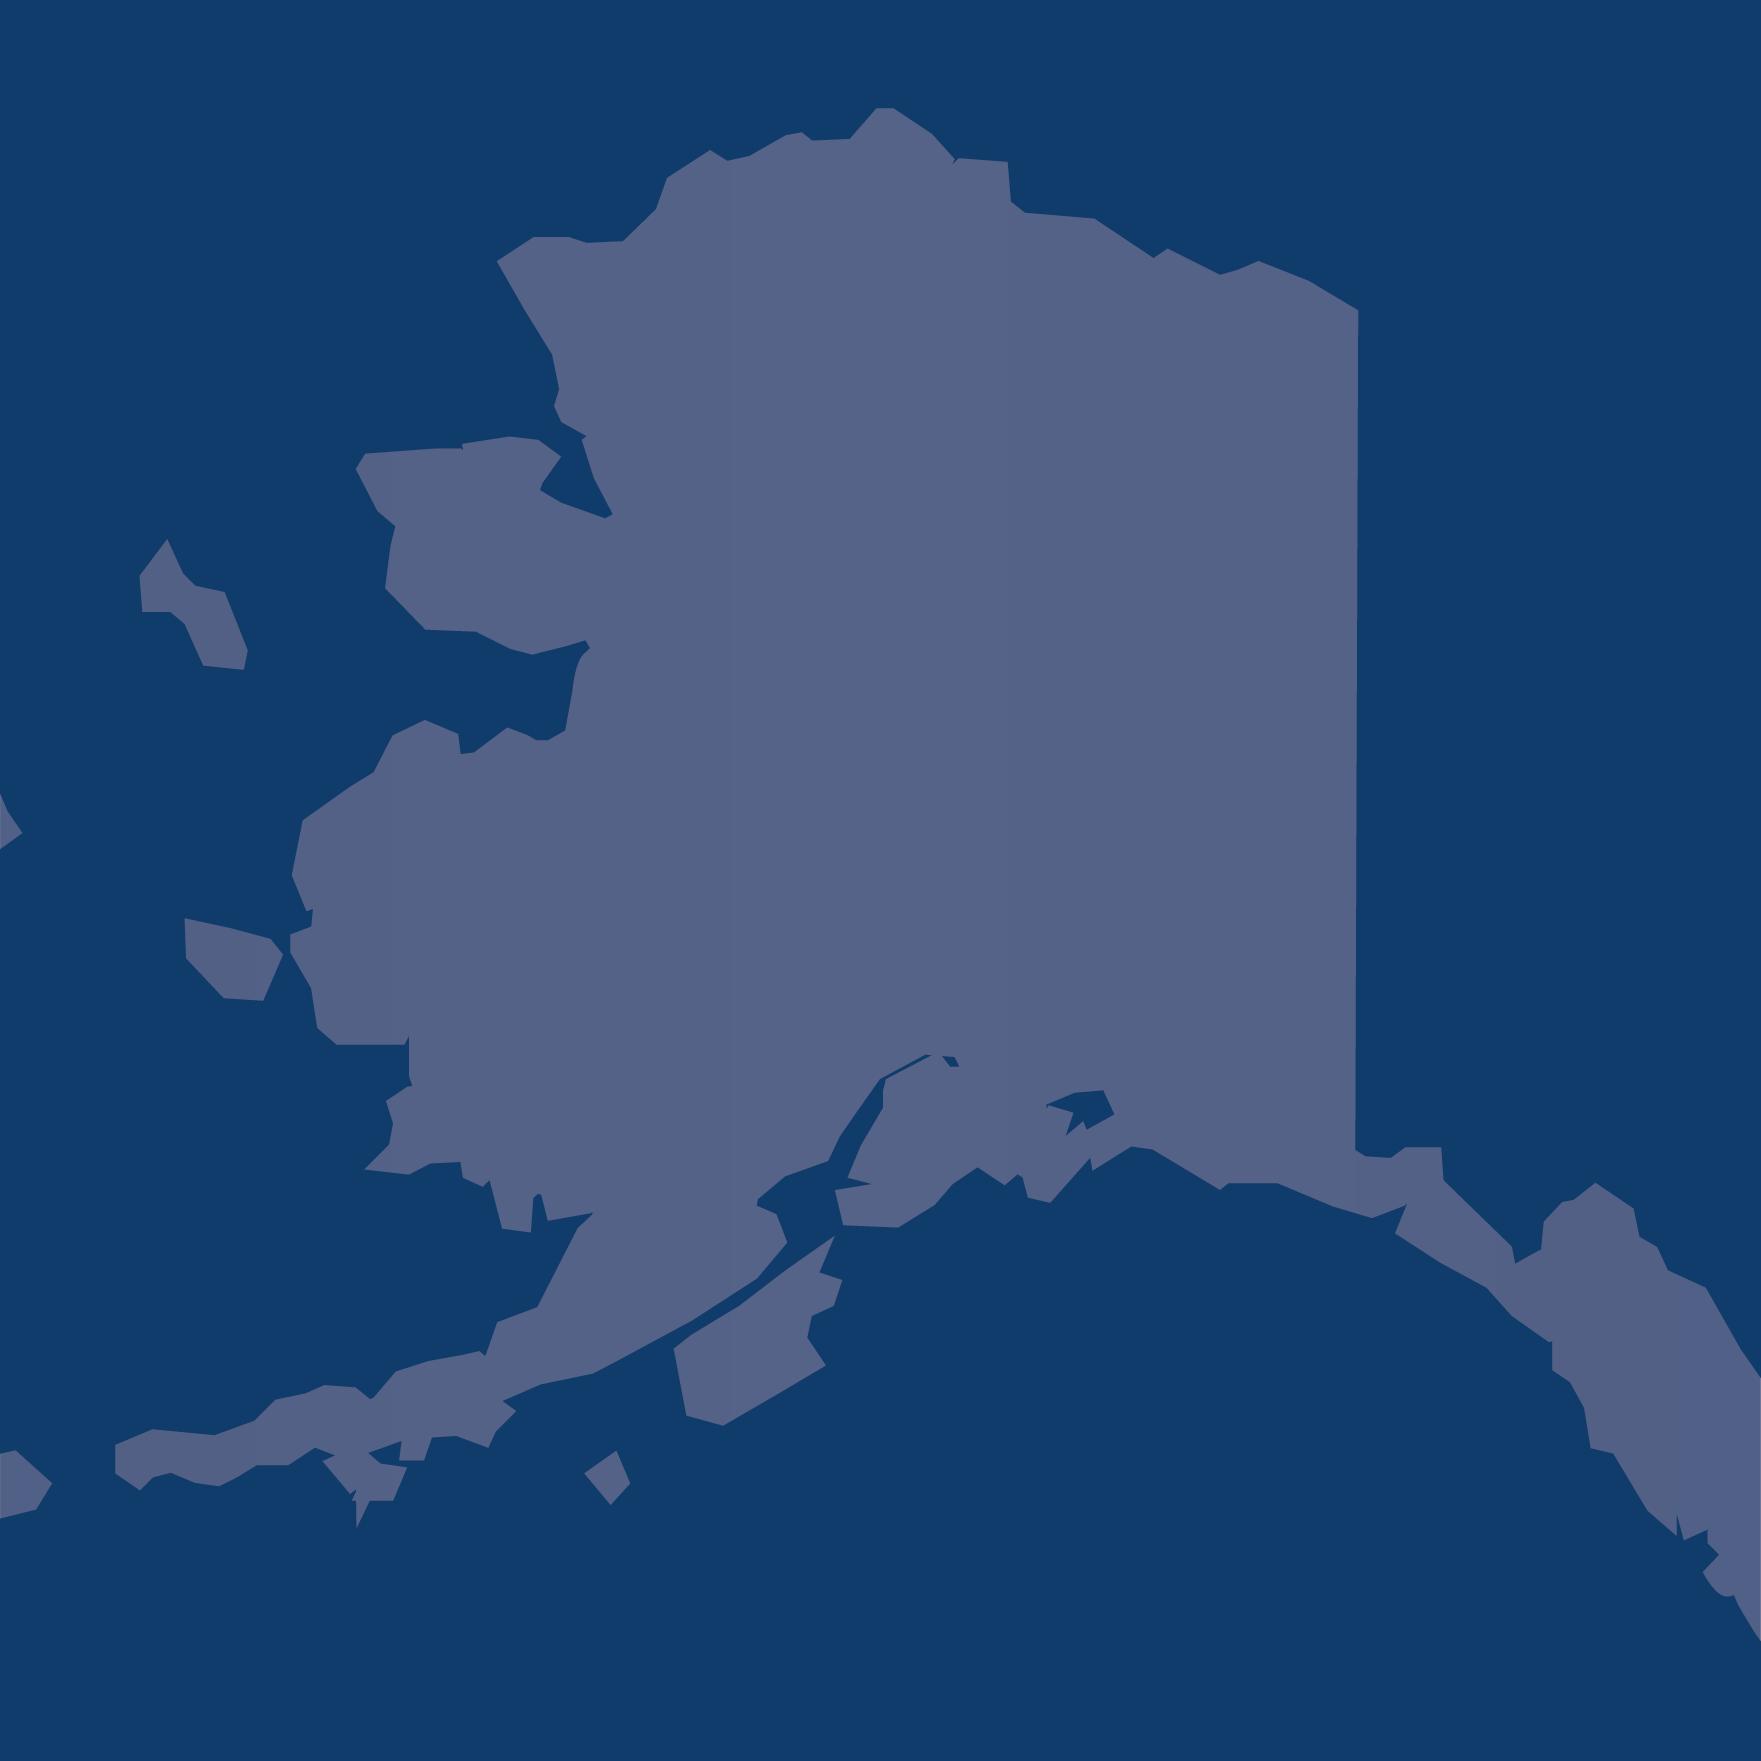 COMING SOON - ALASKA STATE INDEX